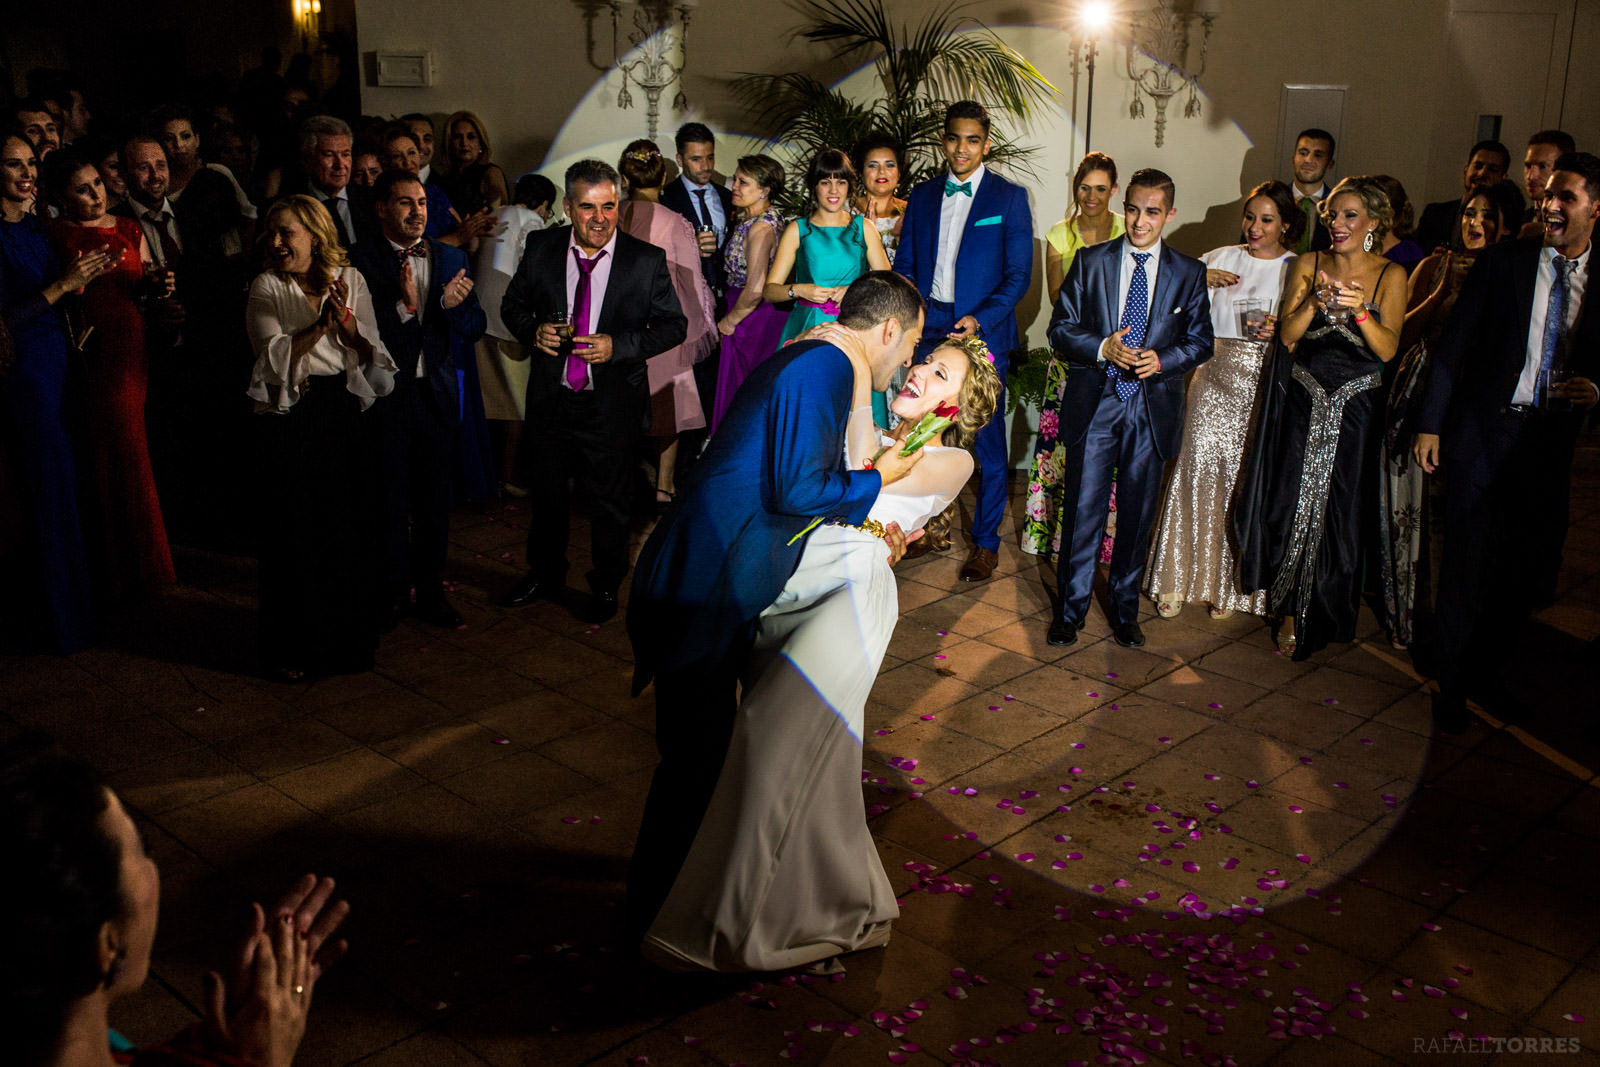 Rafael+Torres+fotografo+bodas+sevilla+madrid+barcelona+wedding+photographer+bodas+diferentes+bodaensevilla+molinillos+fotografo+hacienda+oran+alfonso+wedding+photographer-16.jpg